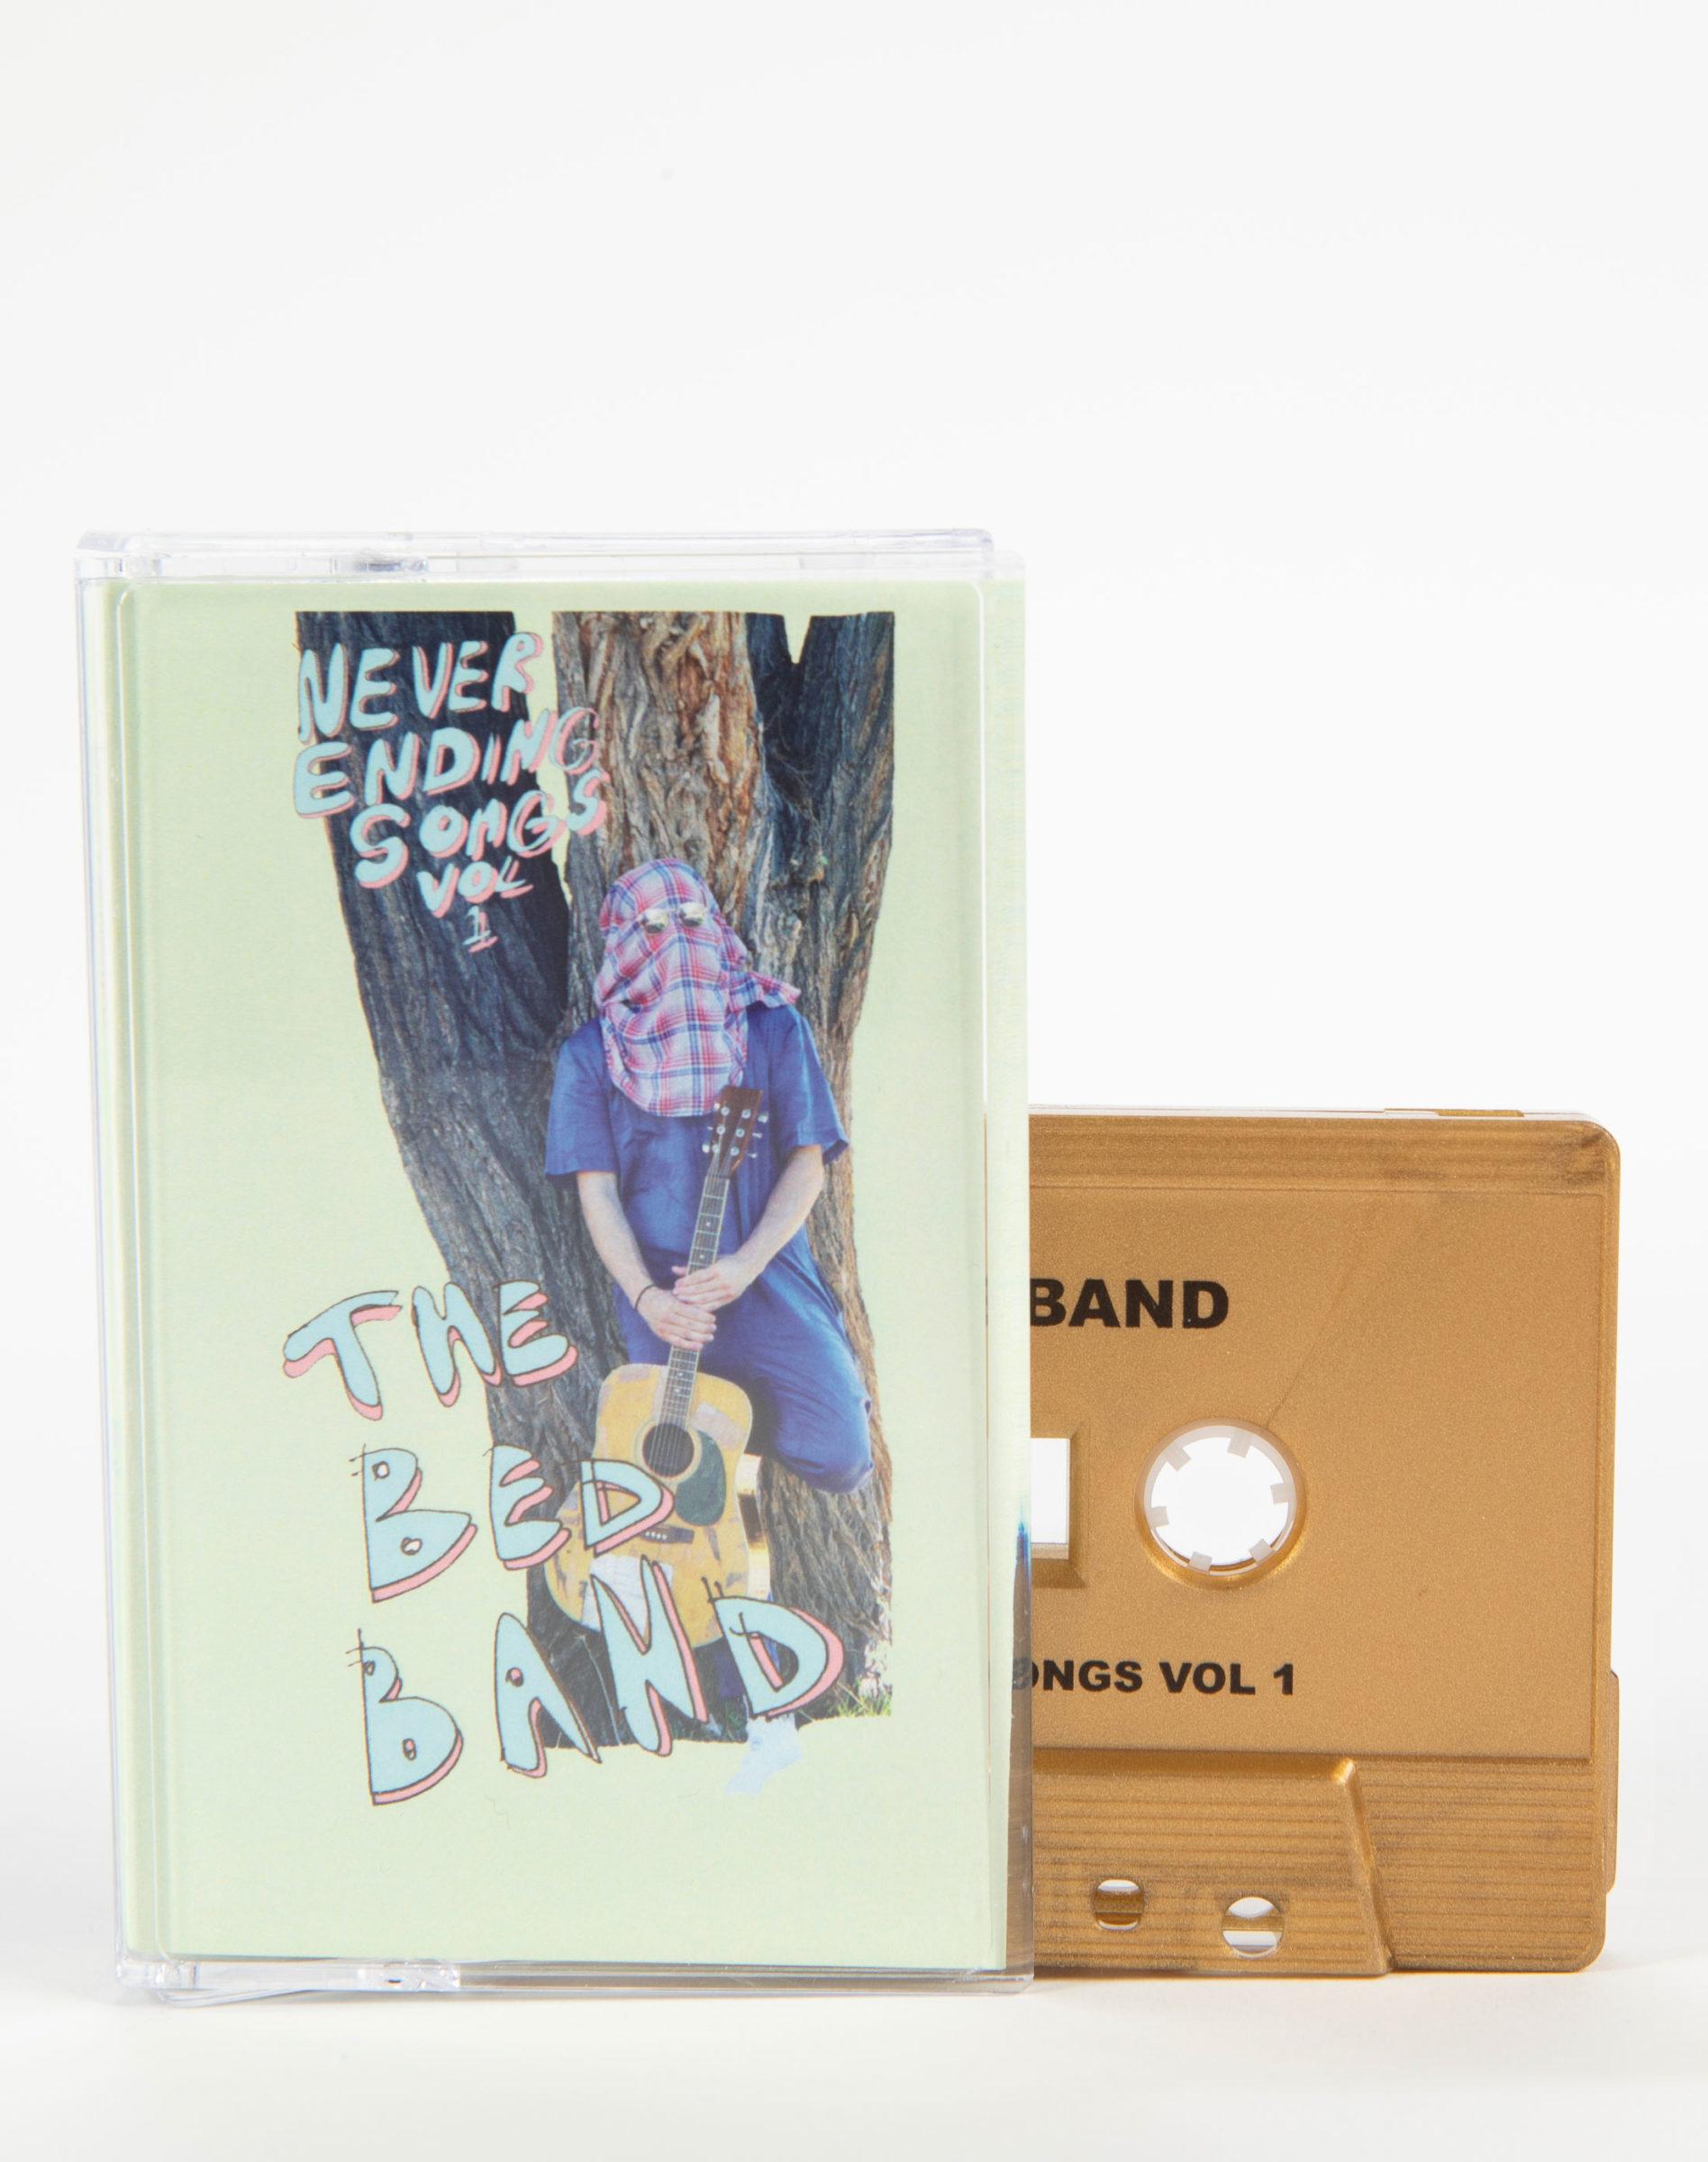 Bed_Band_Cassette_MeowWolf_Shop_2